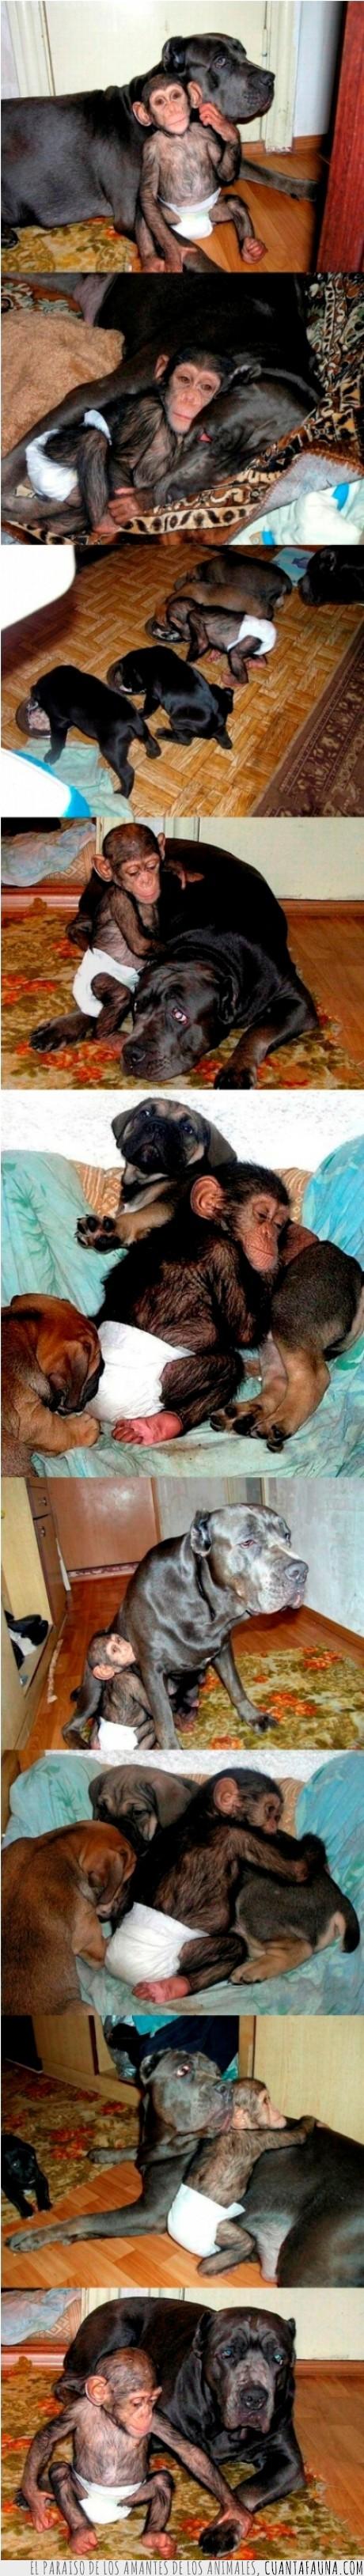 adopción,amor,animal,chimpacé,huérfano,Mastín,mono,perro